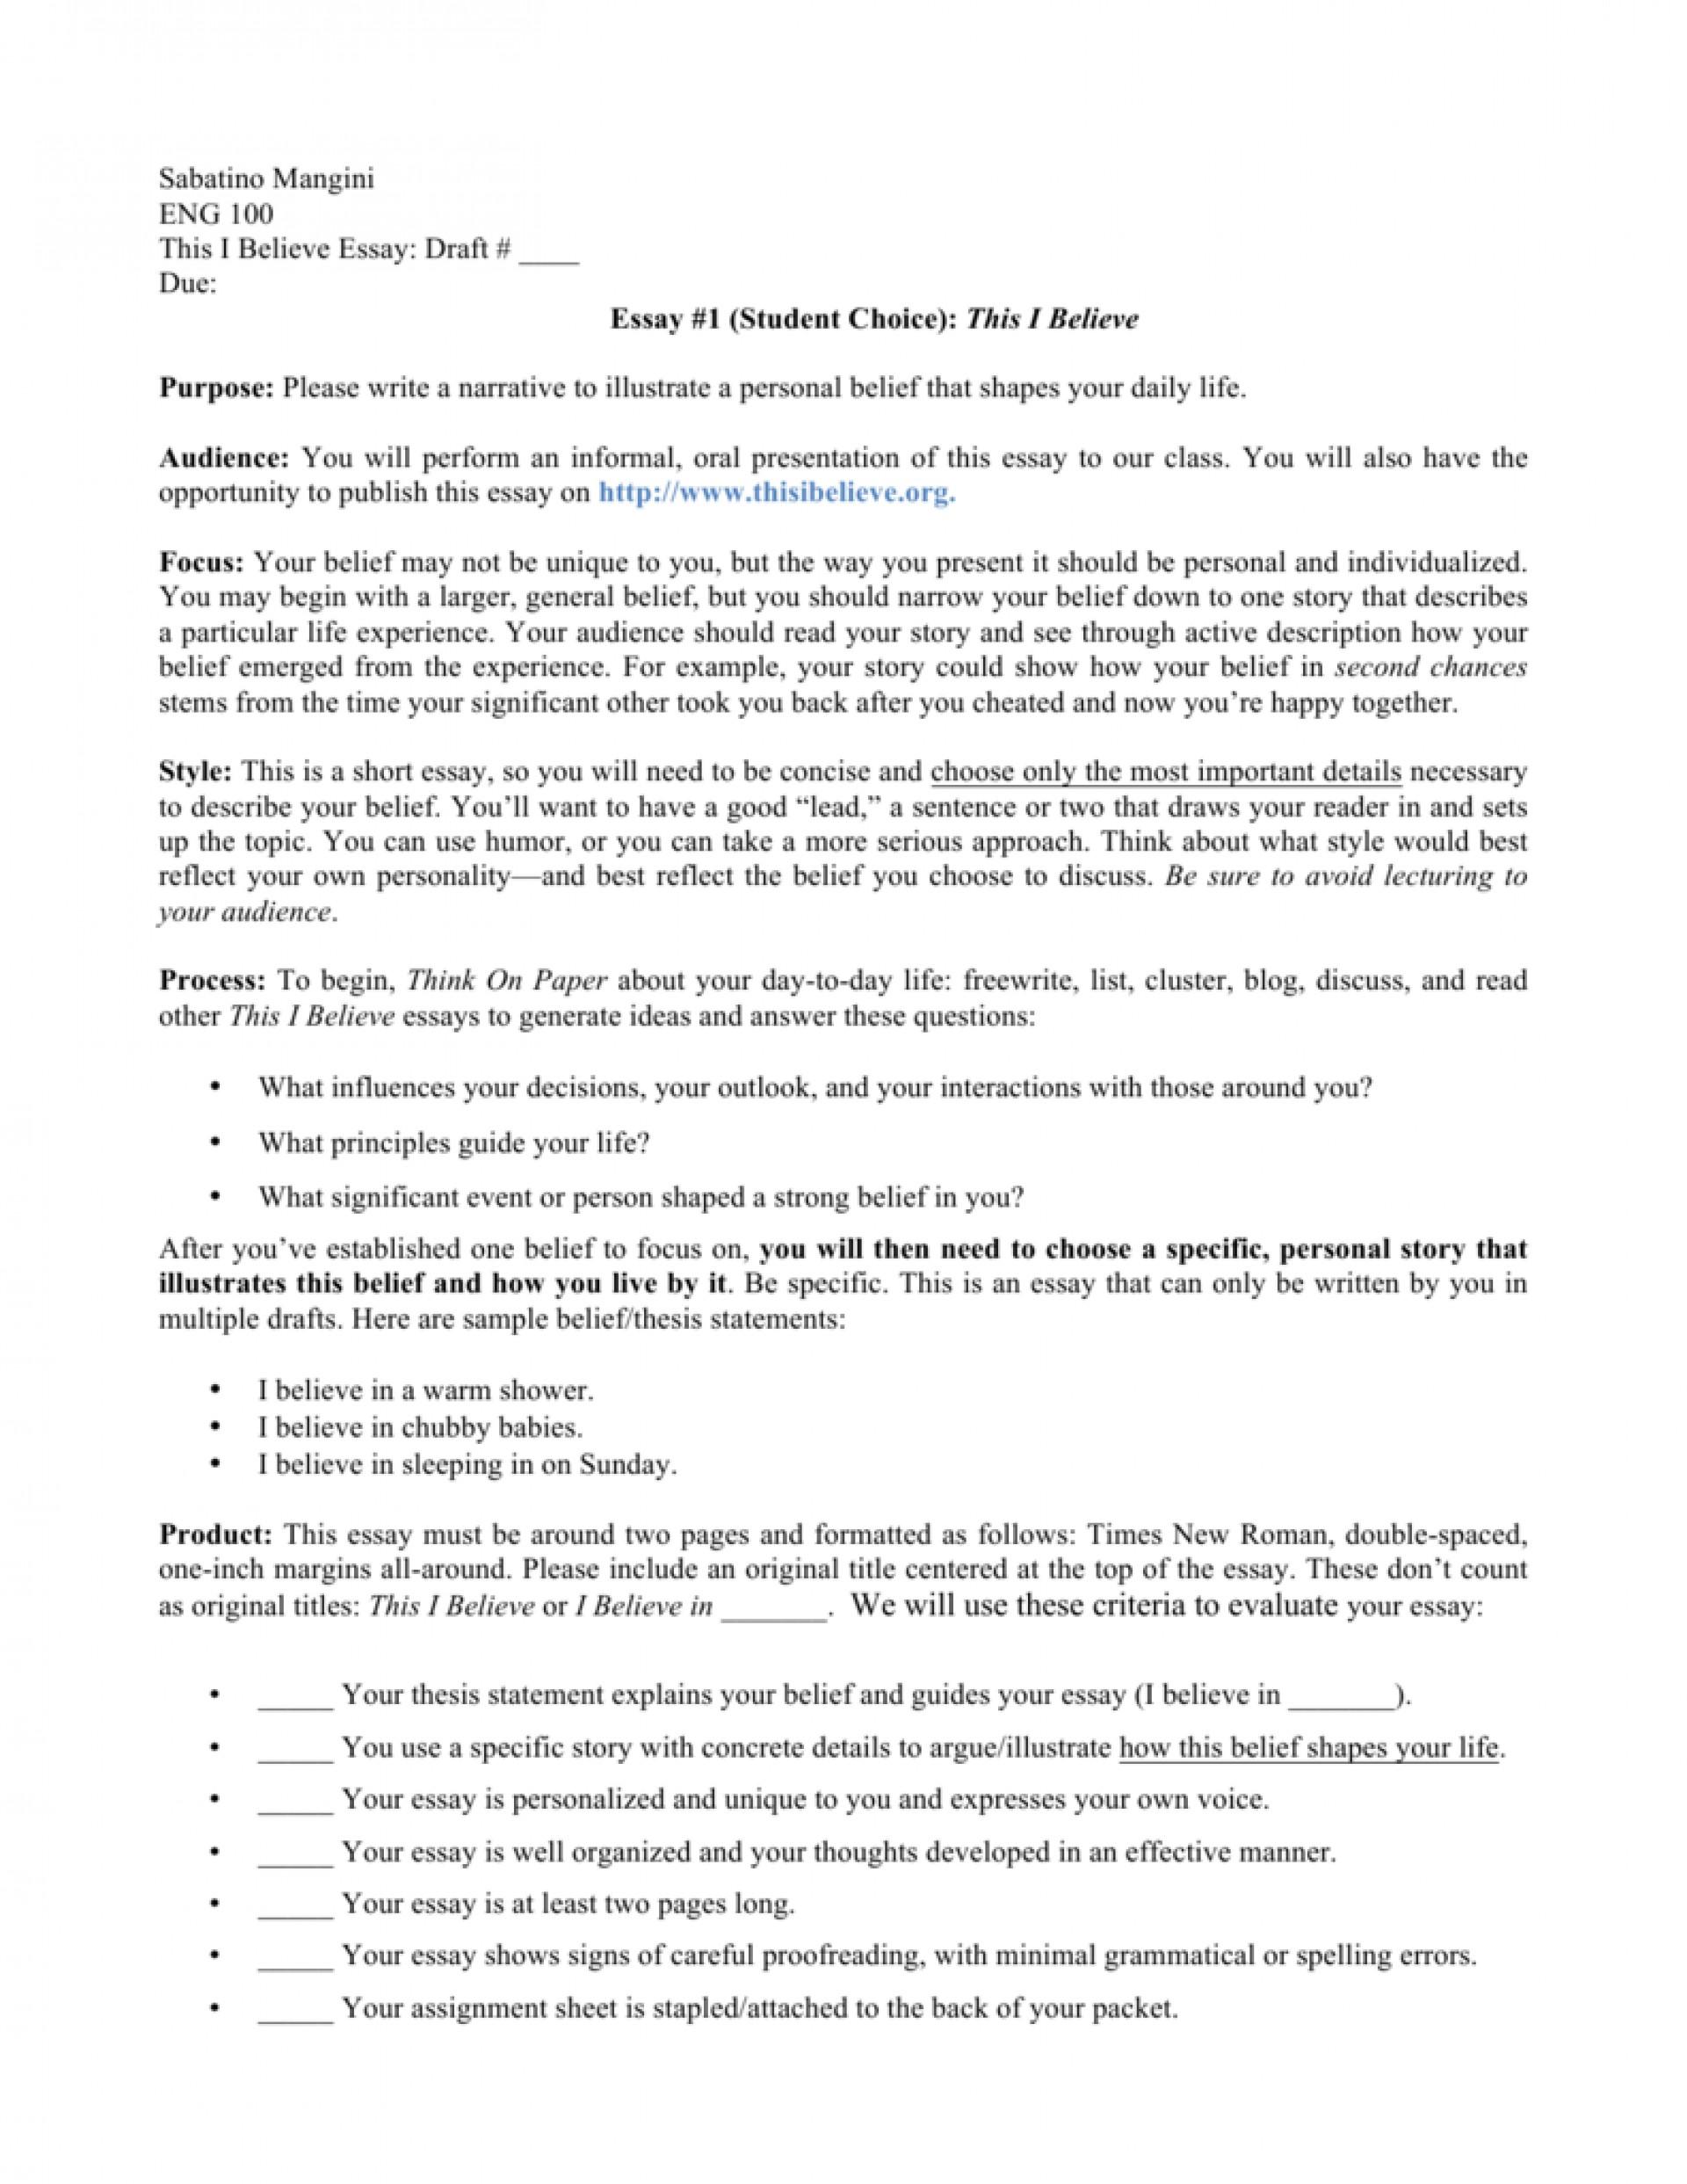 004 Thisibelieve Org Essays Featured 008807227 1 Essay Amazing Thisibelieve.org 1920